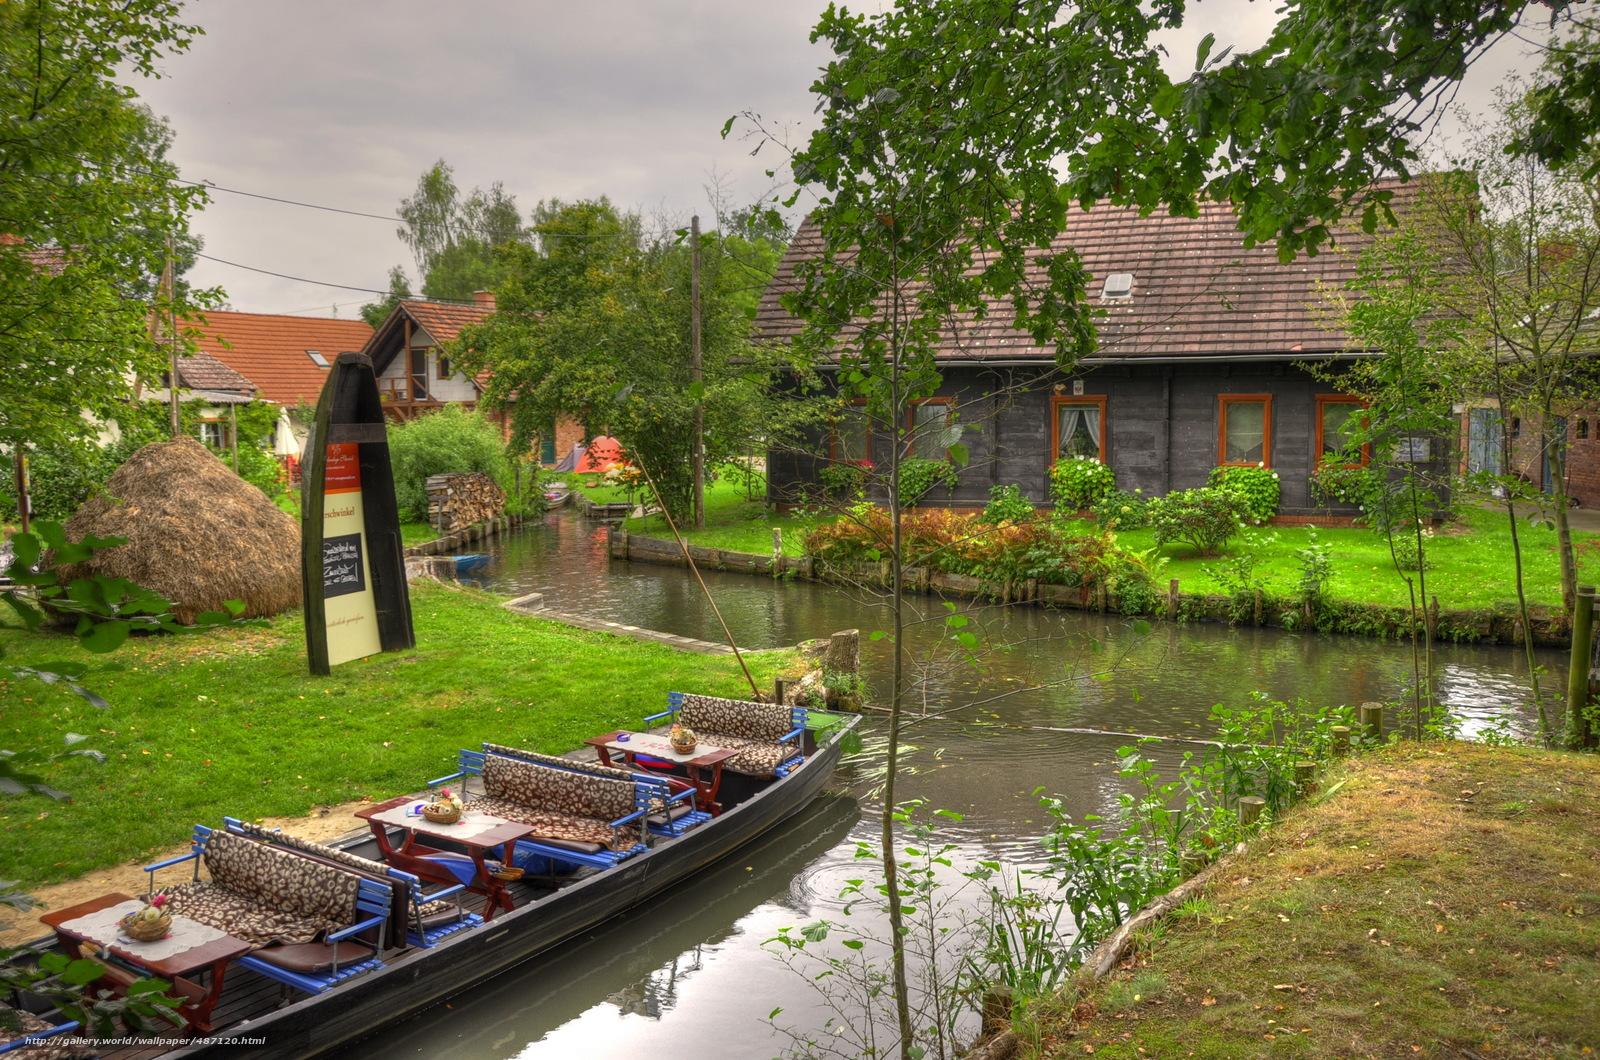 Download wallpaper Germany,  boat,  river,  brandenburg lubbenau free desktop wallpaper in the resolution 3264x2162 — picture №487120